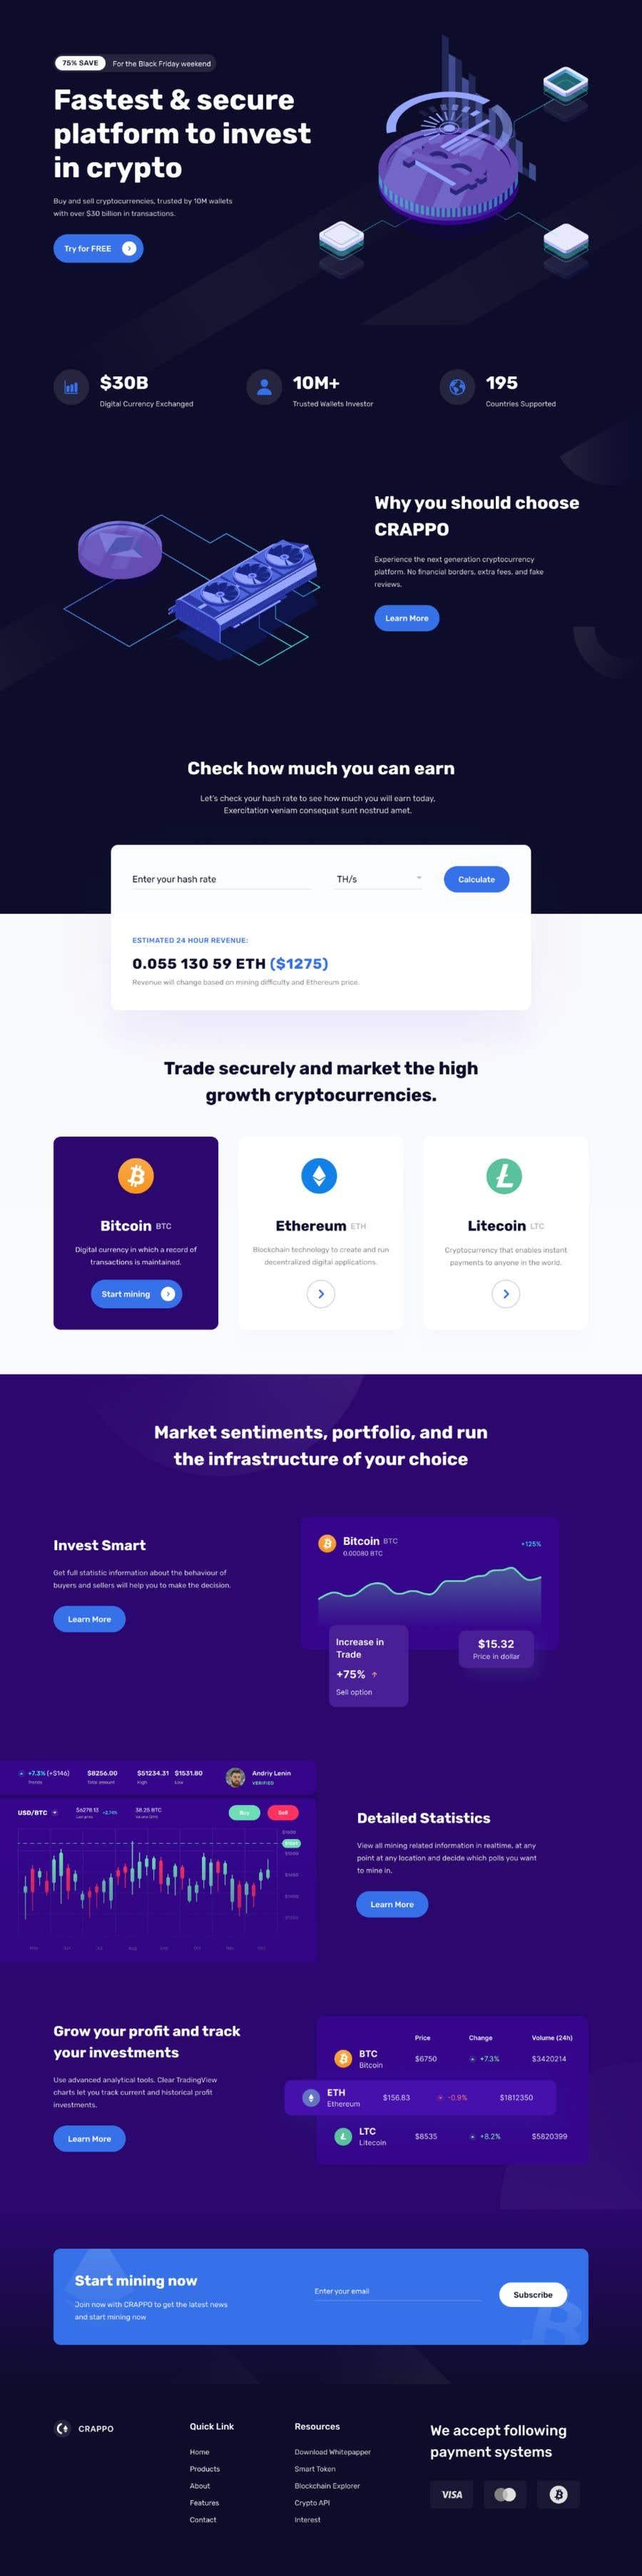 Penyertaan Peraduan #                                        10                                      untuk                                         Contest – Crypto Information Website Section: $100